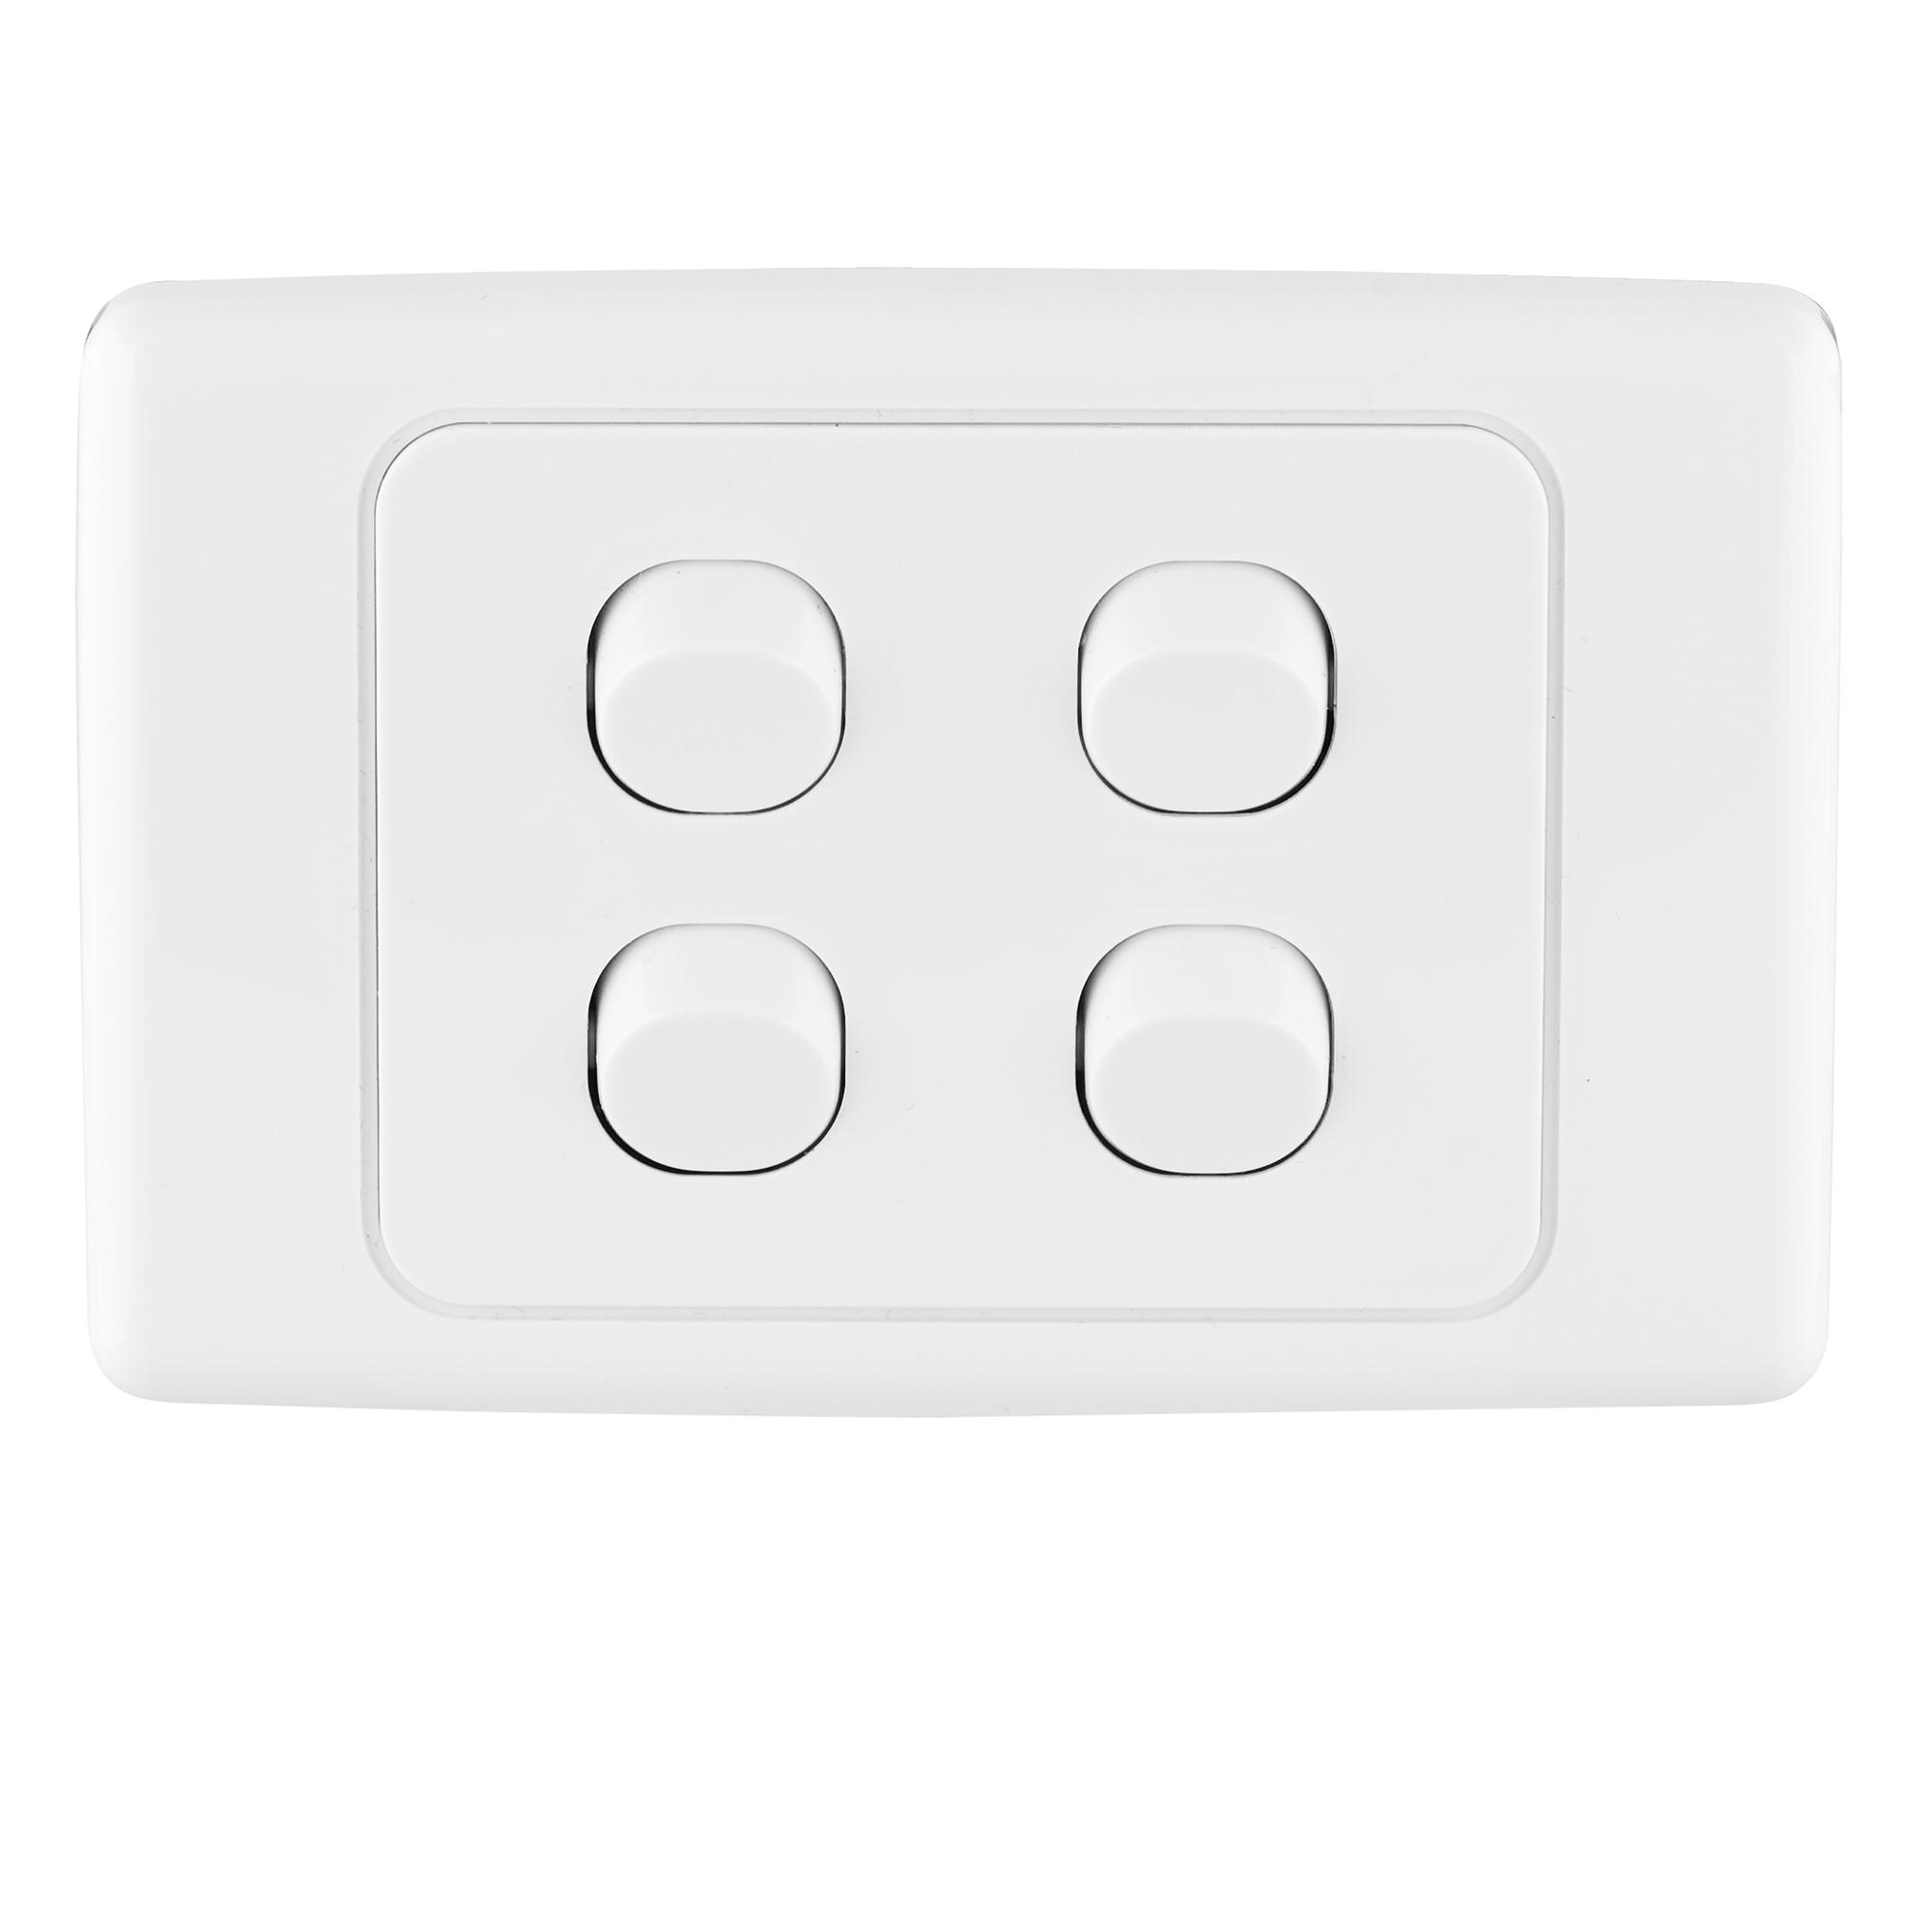 Deta quad switch